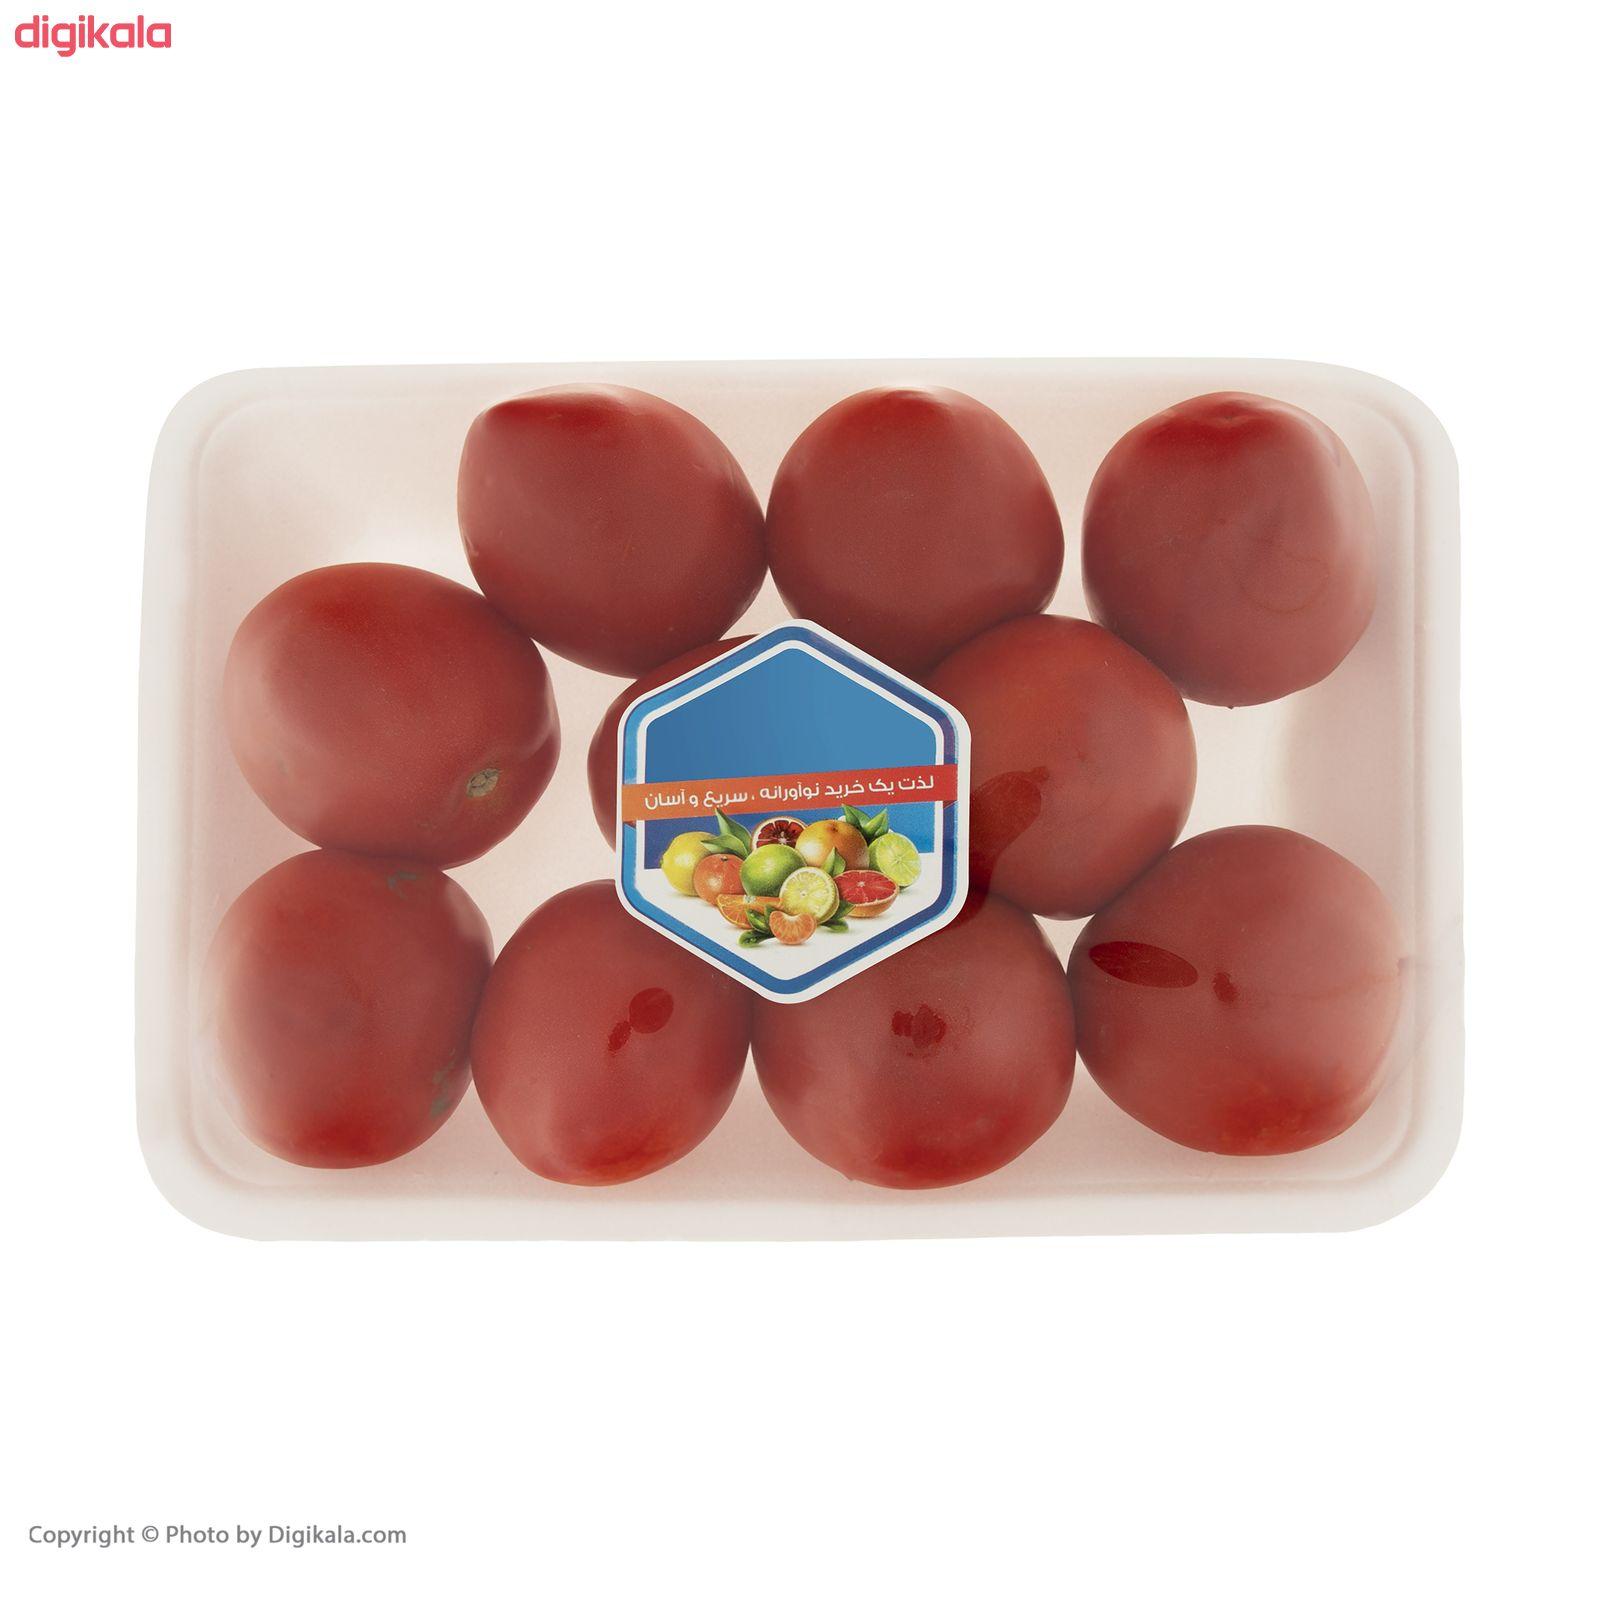 گوجه فرنگی بوته ای میوه پلاس - 1 کیلوگرم main 1 4